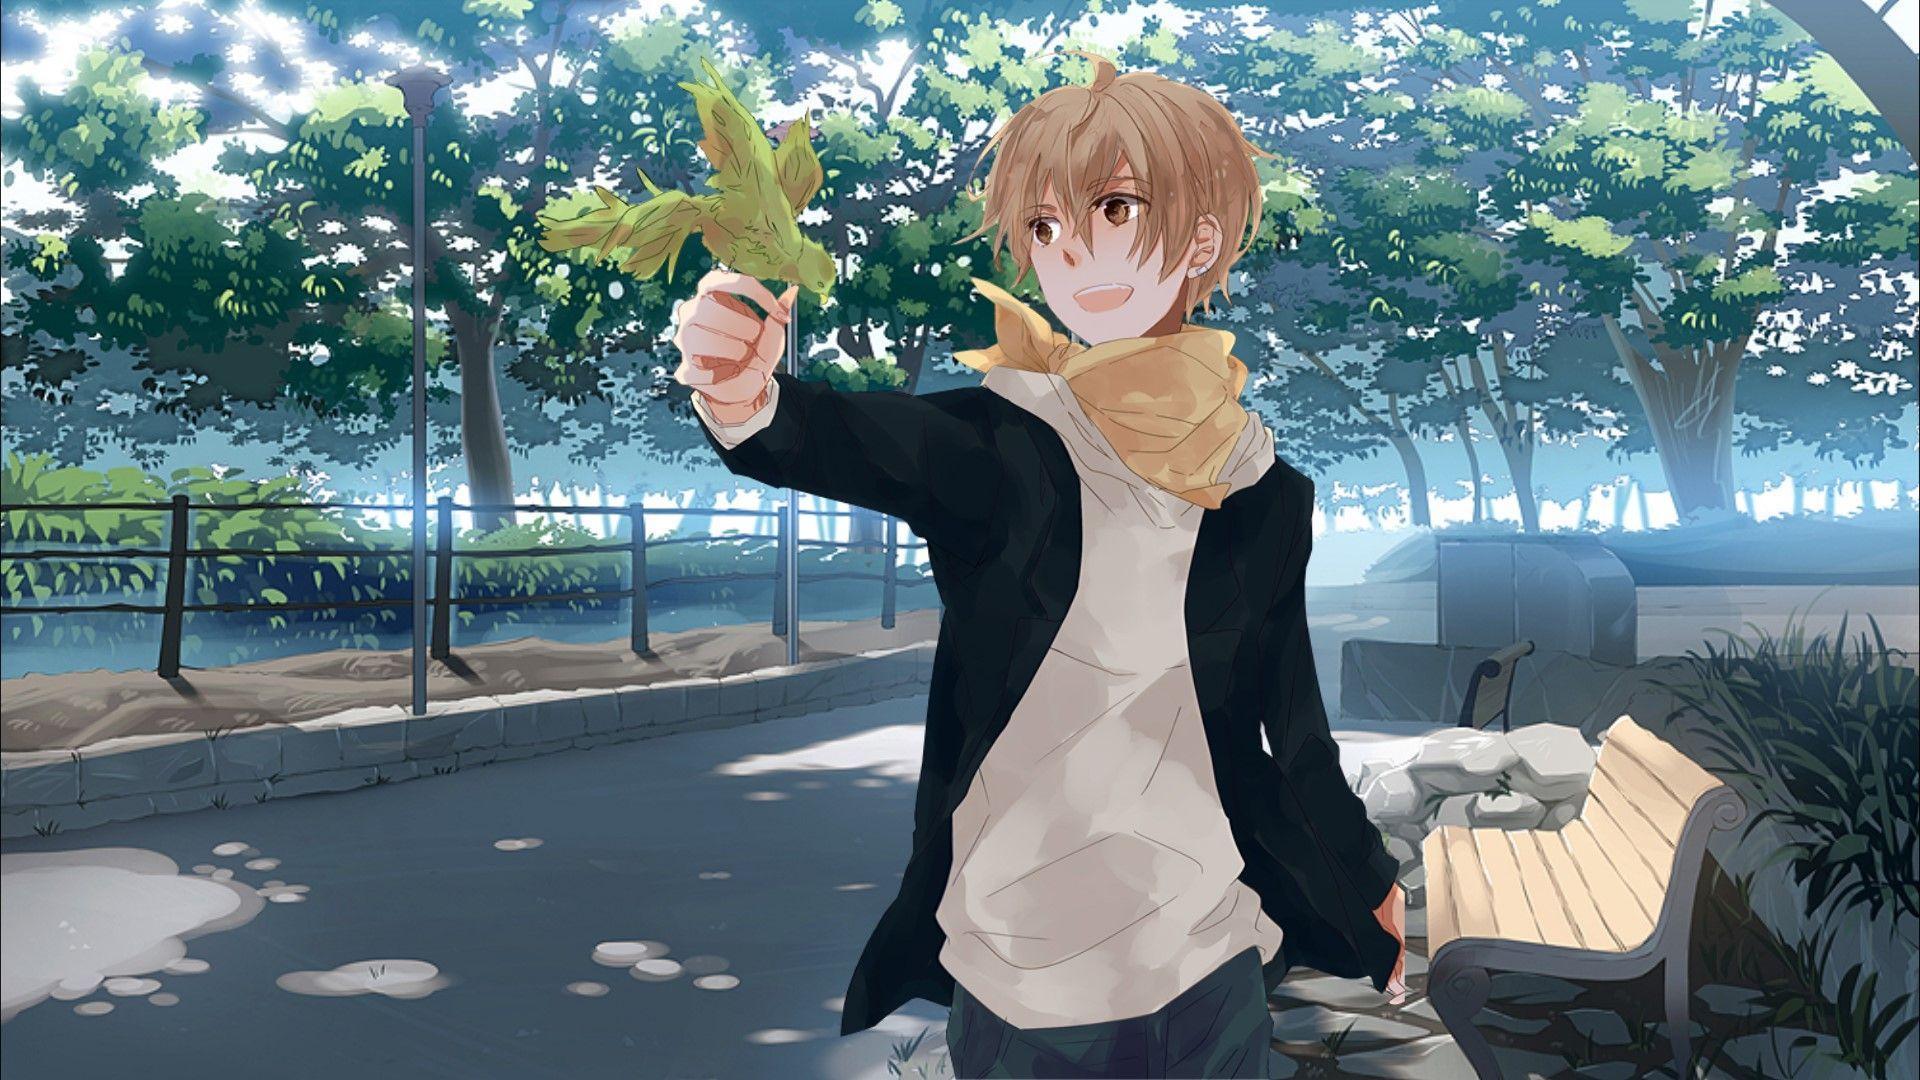 Wallpaper wiki cute anime boy background pic wpc0012498